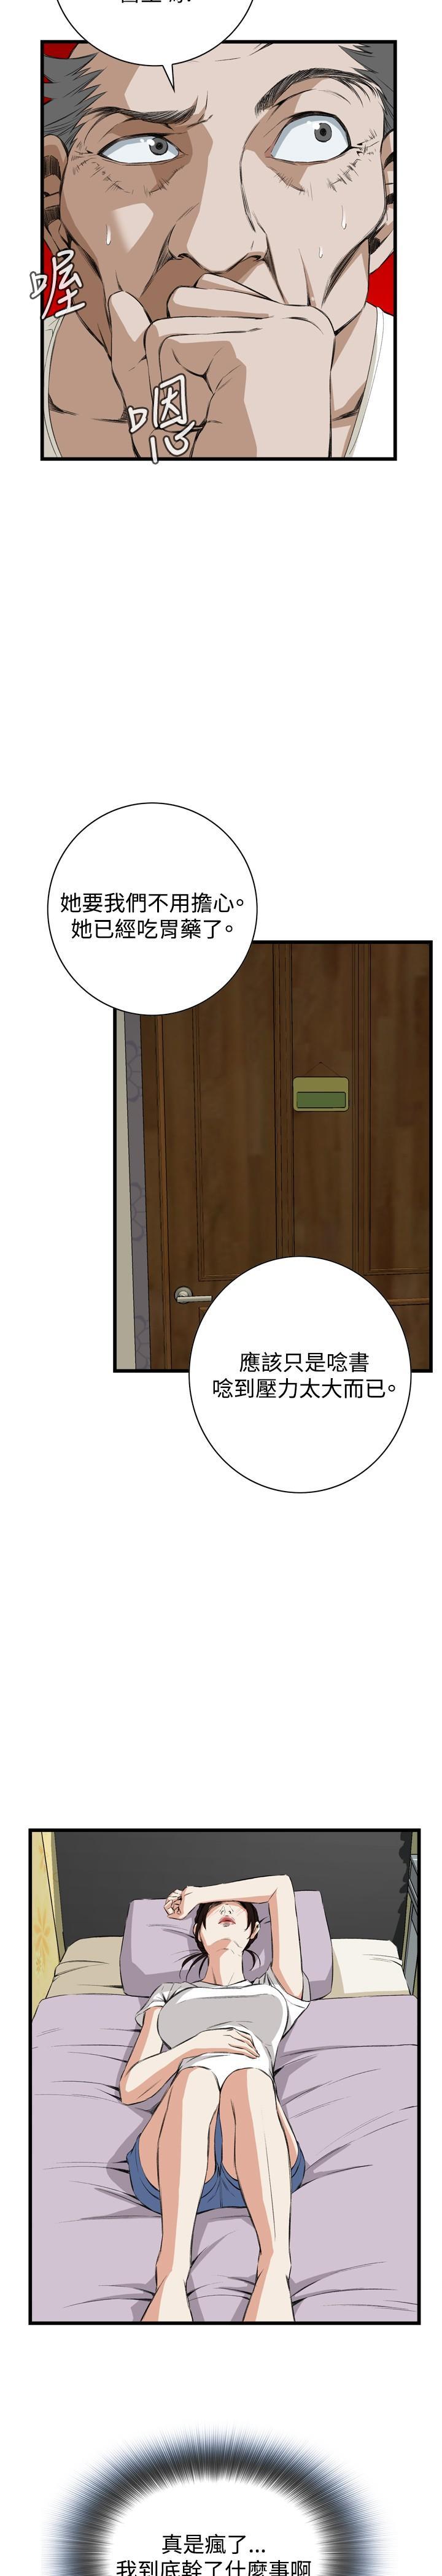 Take a Peek 偷窥 Ch.39~60 [Chinese]中文 416